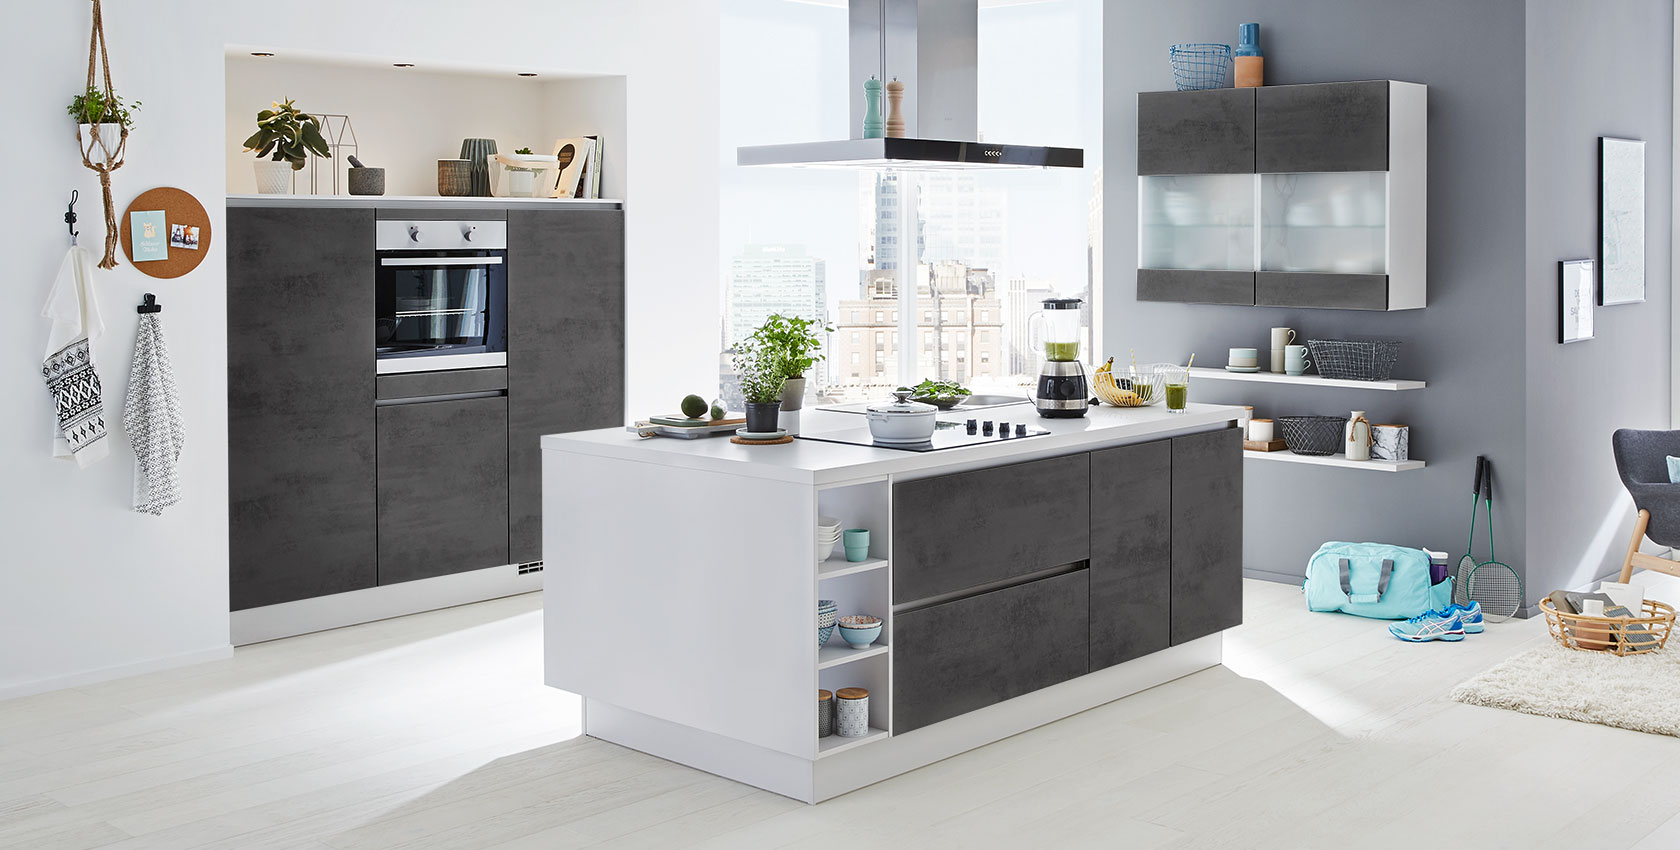 Küche mit freistehender Kochinsel Nobilia Riva ca. 180 / 120 / 210 x 117 cm, Front Beton grau ...